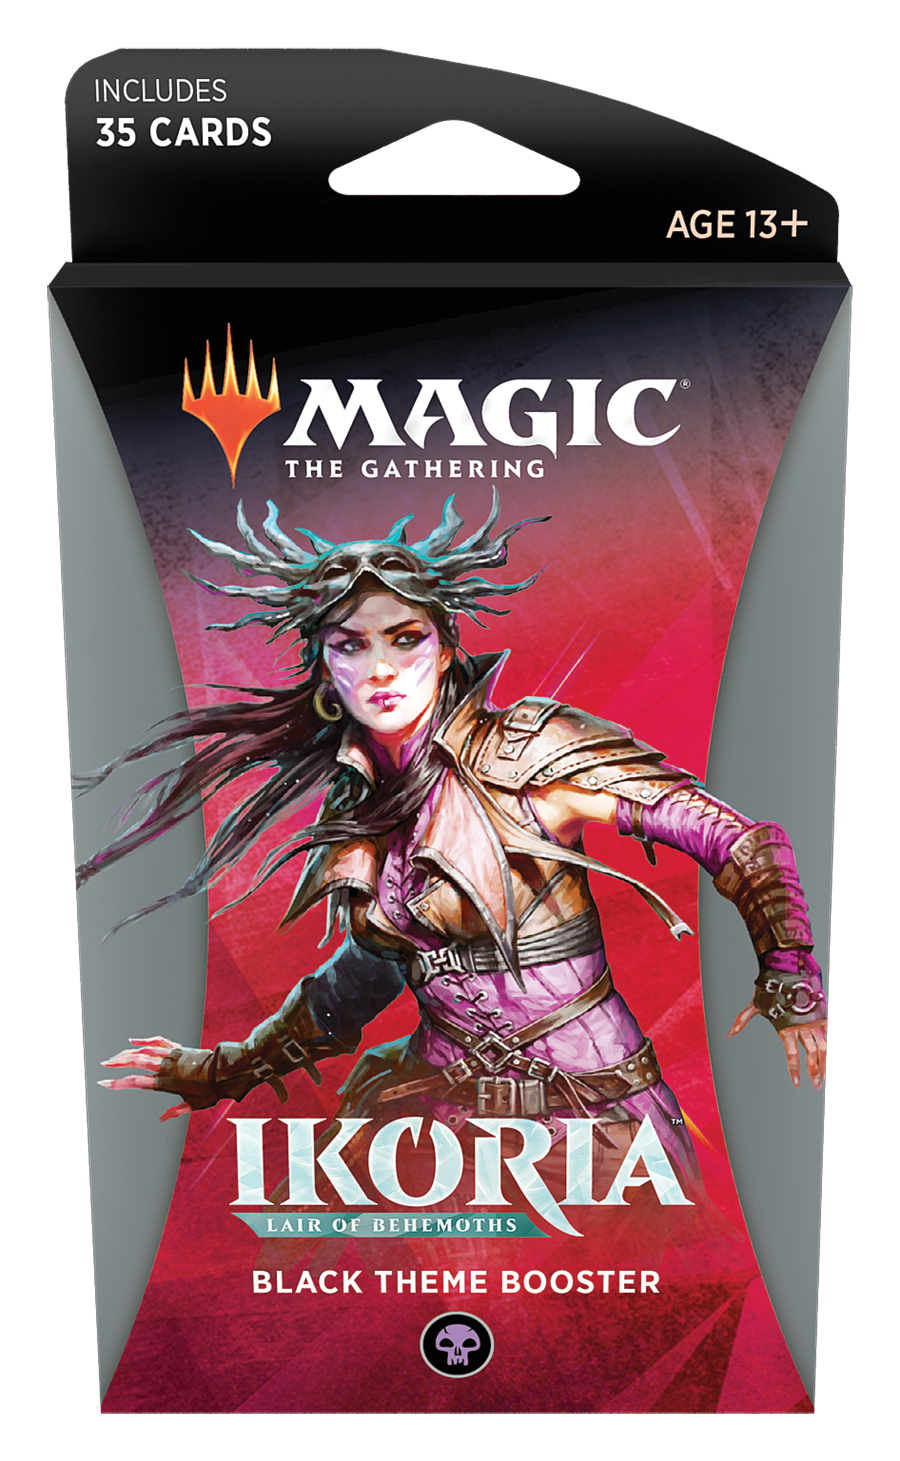 Magic the Gathering: Ikoria: Lair of Behemoths - Theme Booster Black image